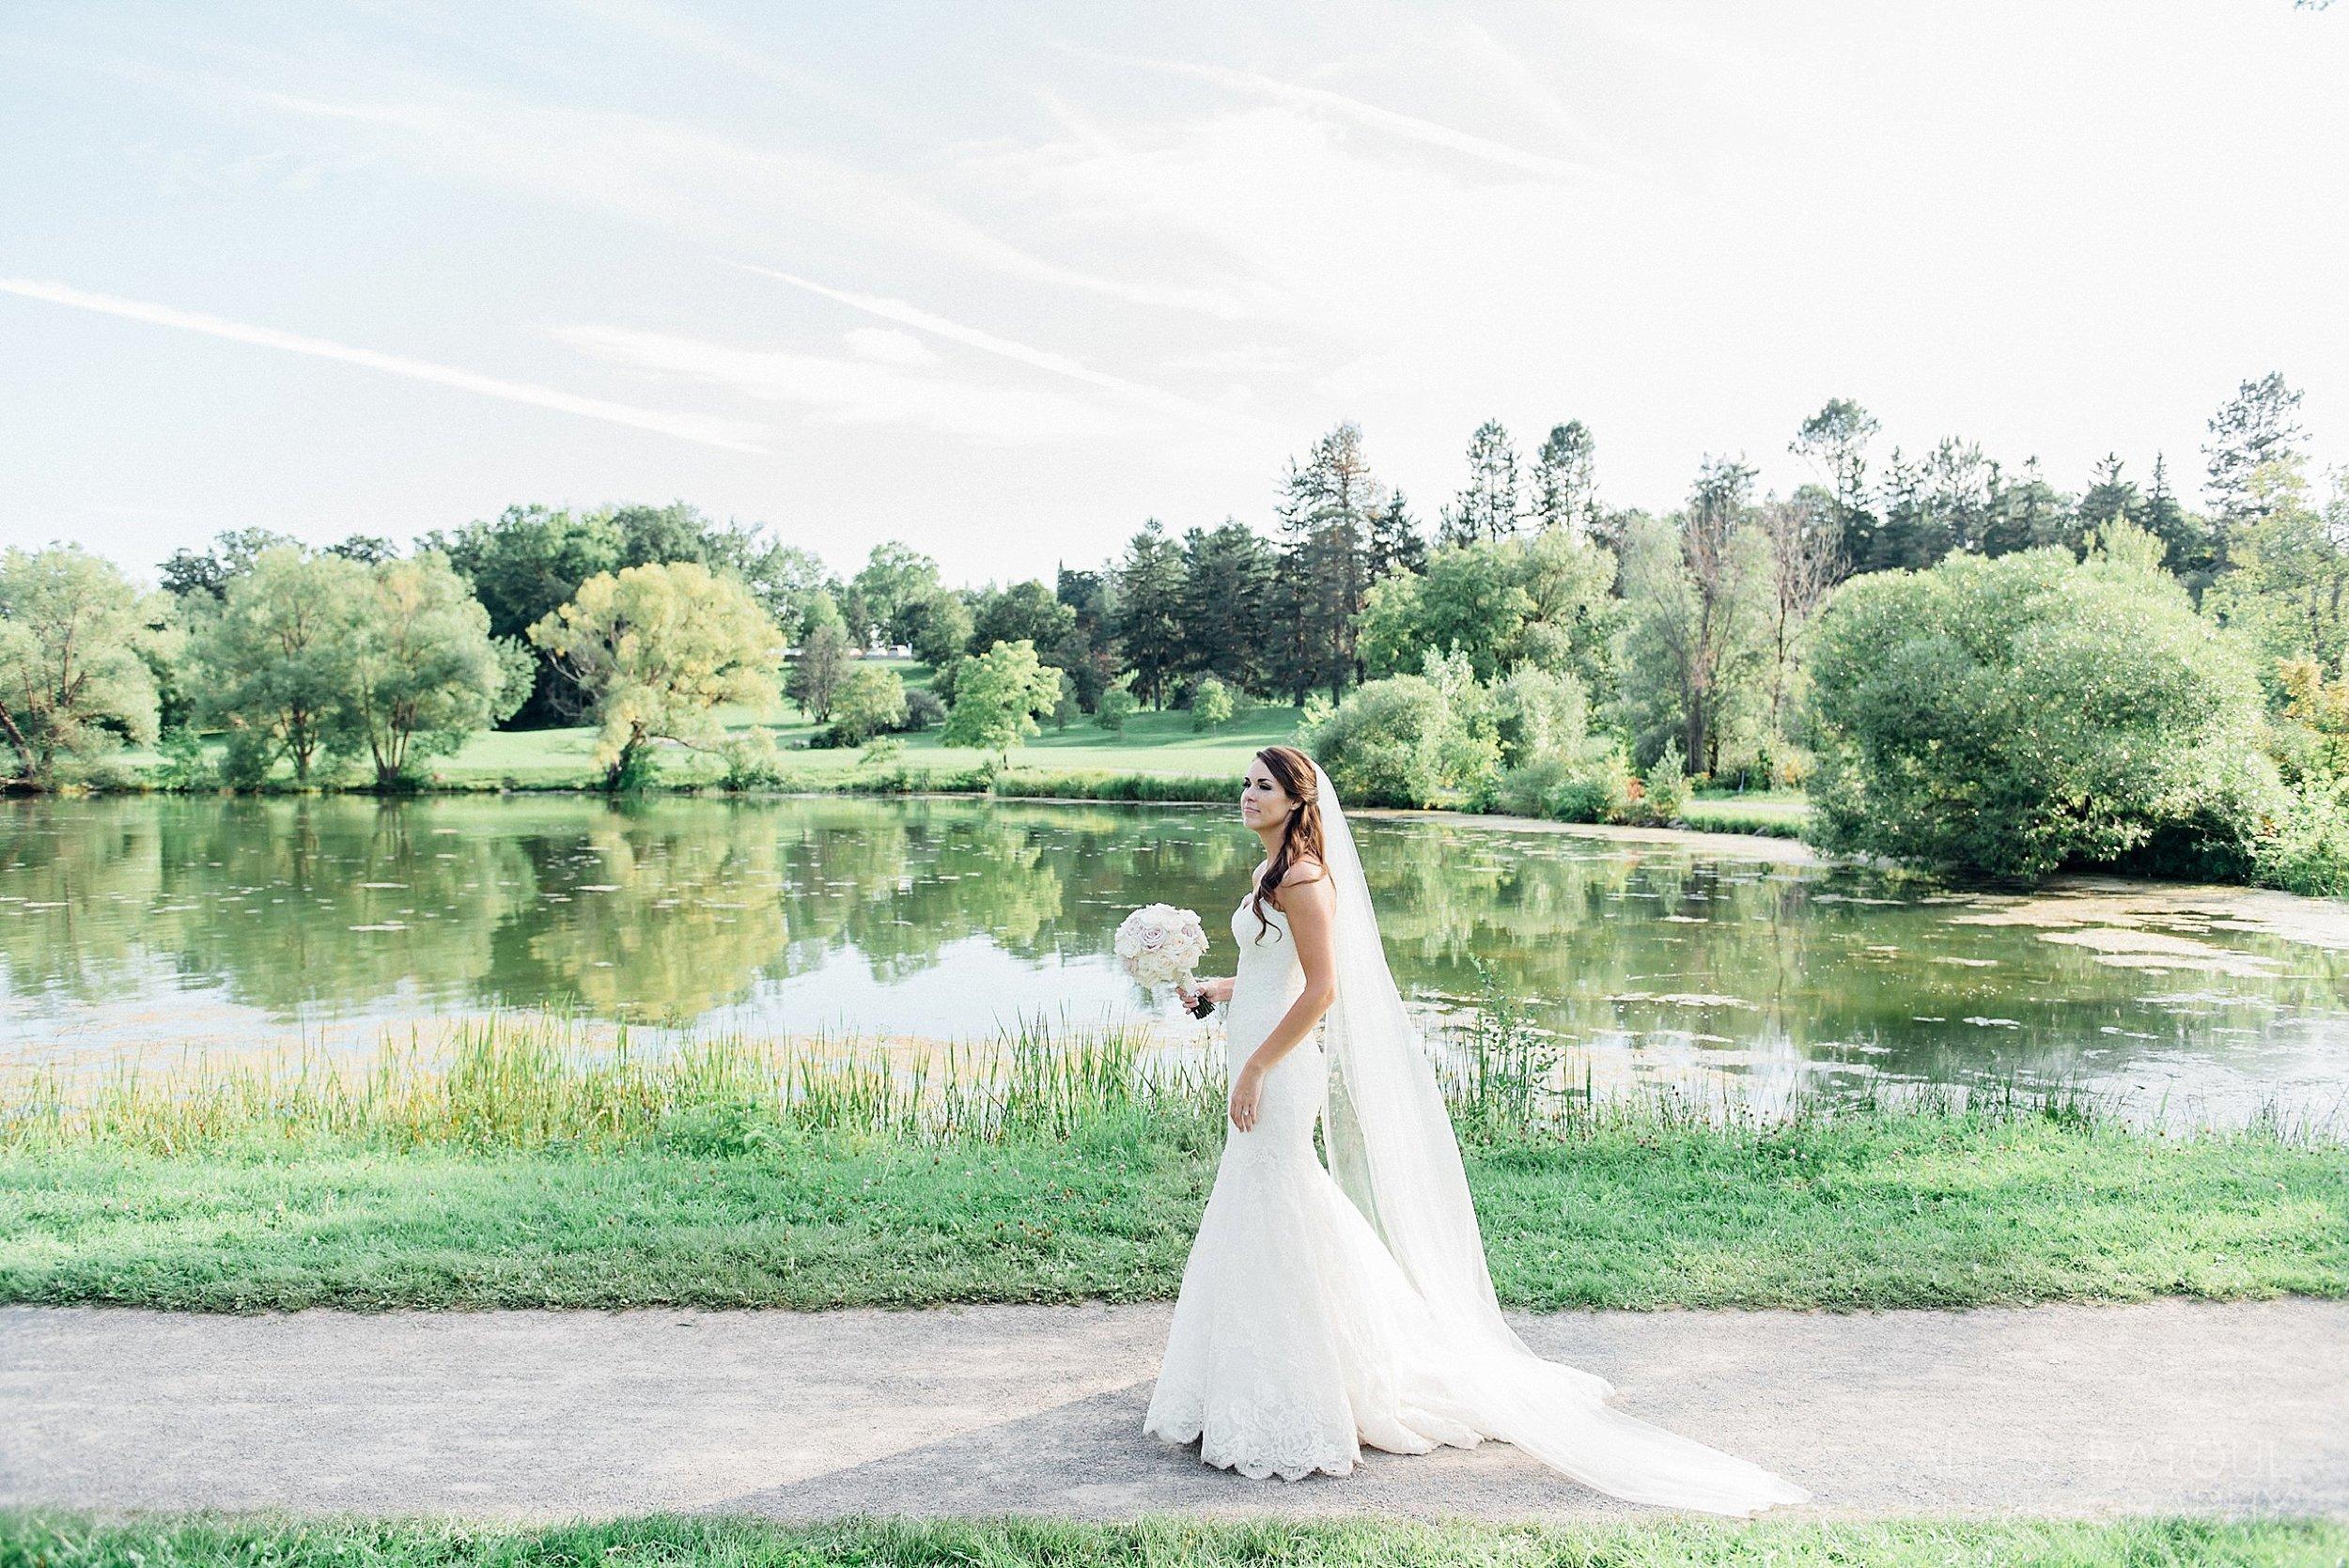 Ali & Batoul Photography - Documentary Fine Art Ottawa Wedding Photography_0047.jpg